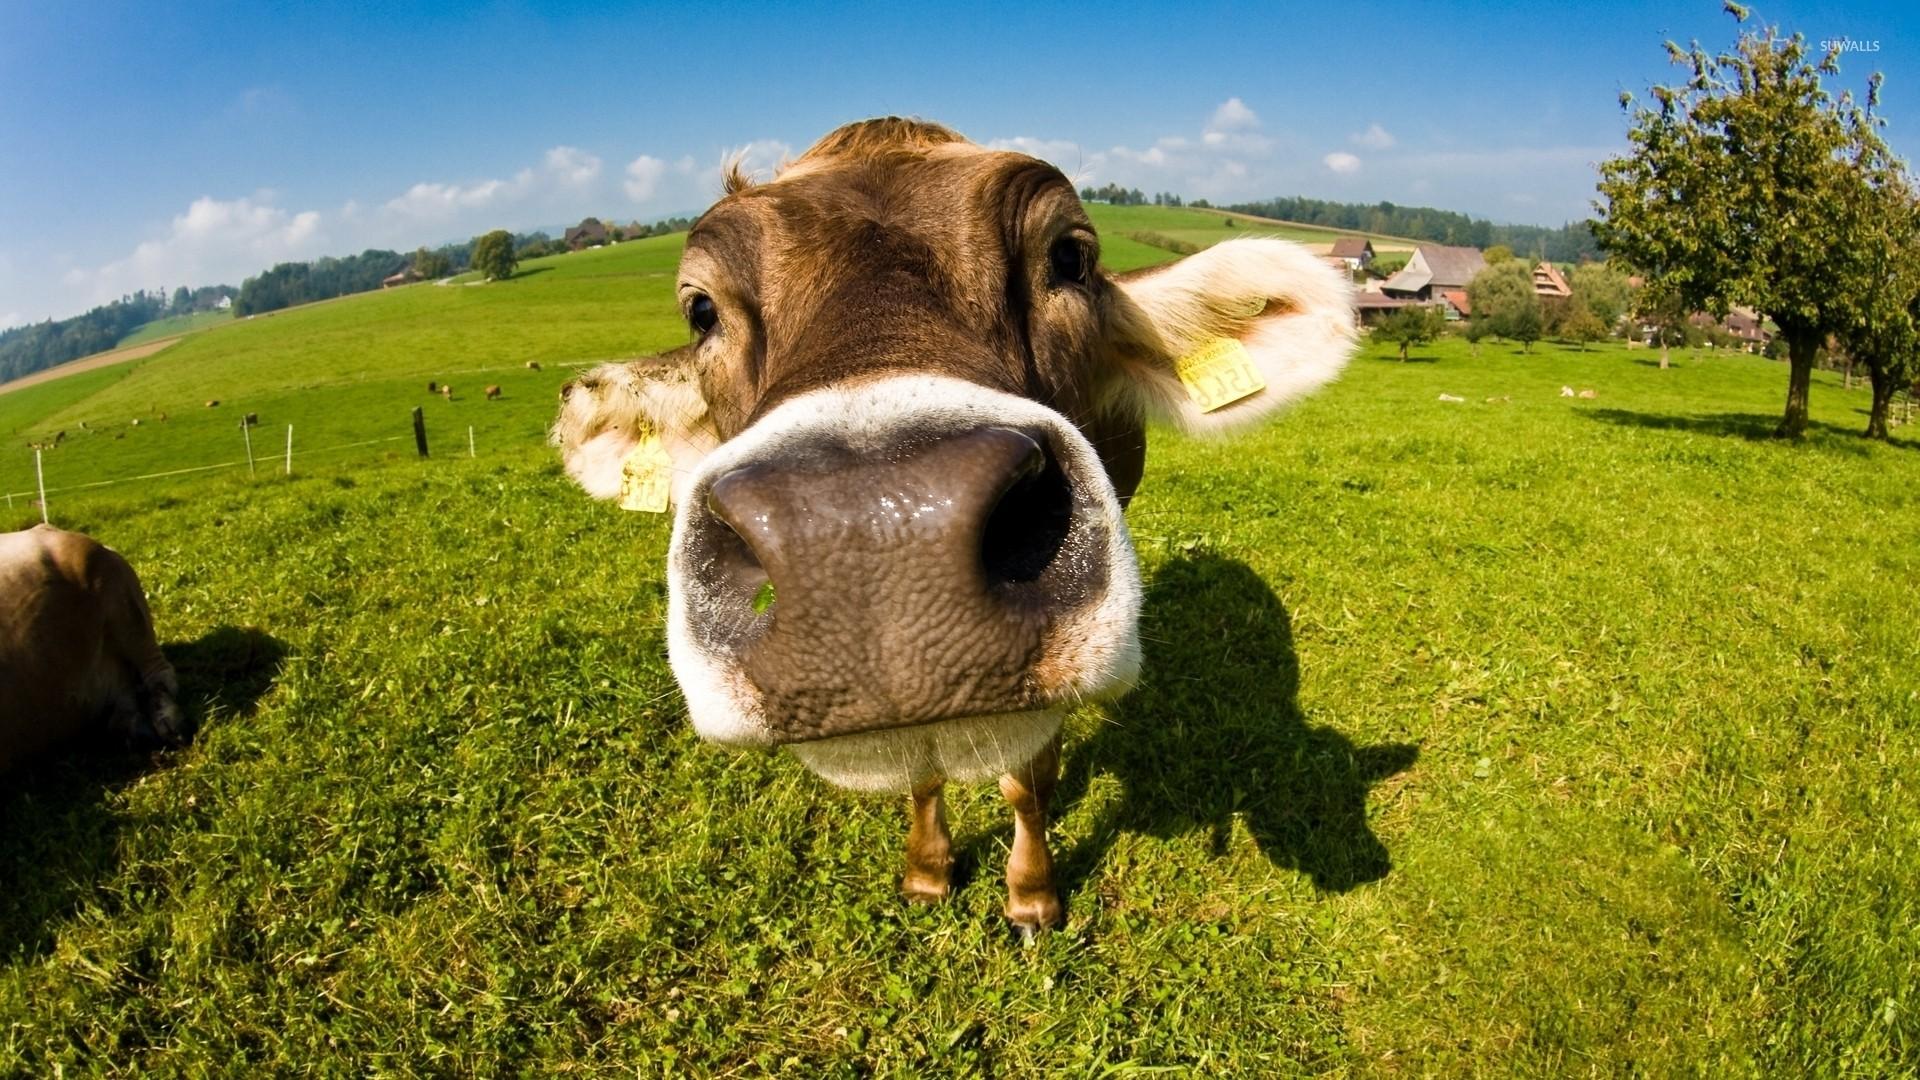 Cow Download Wallpaper